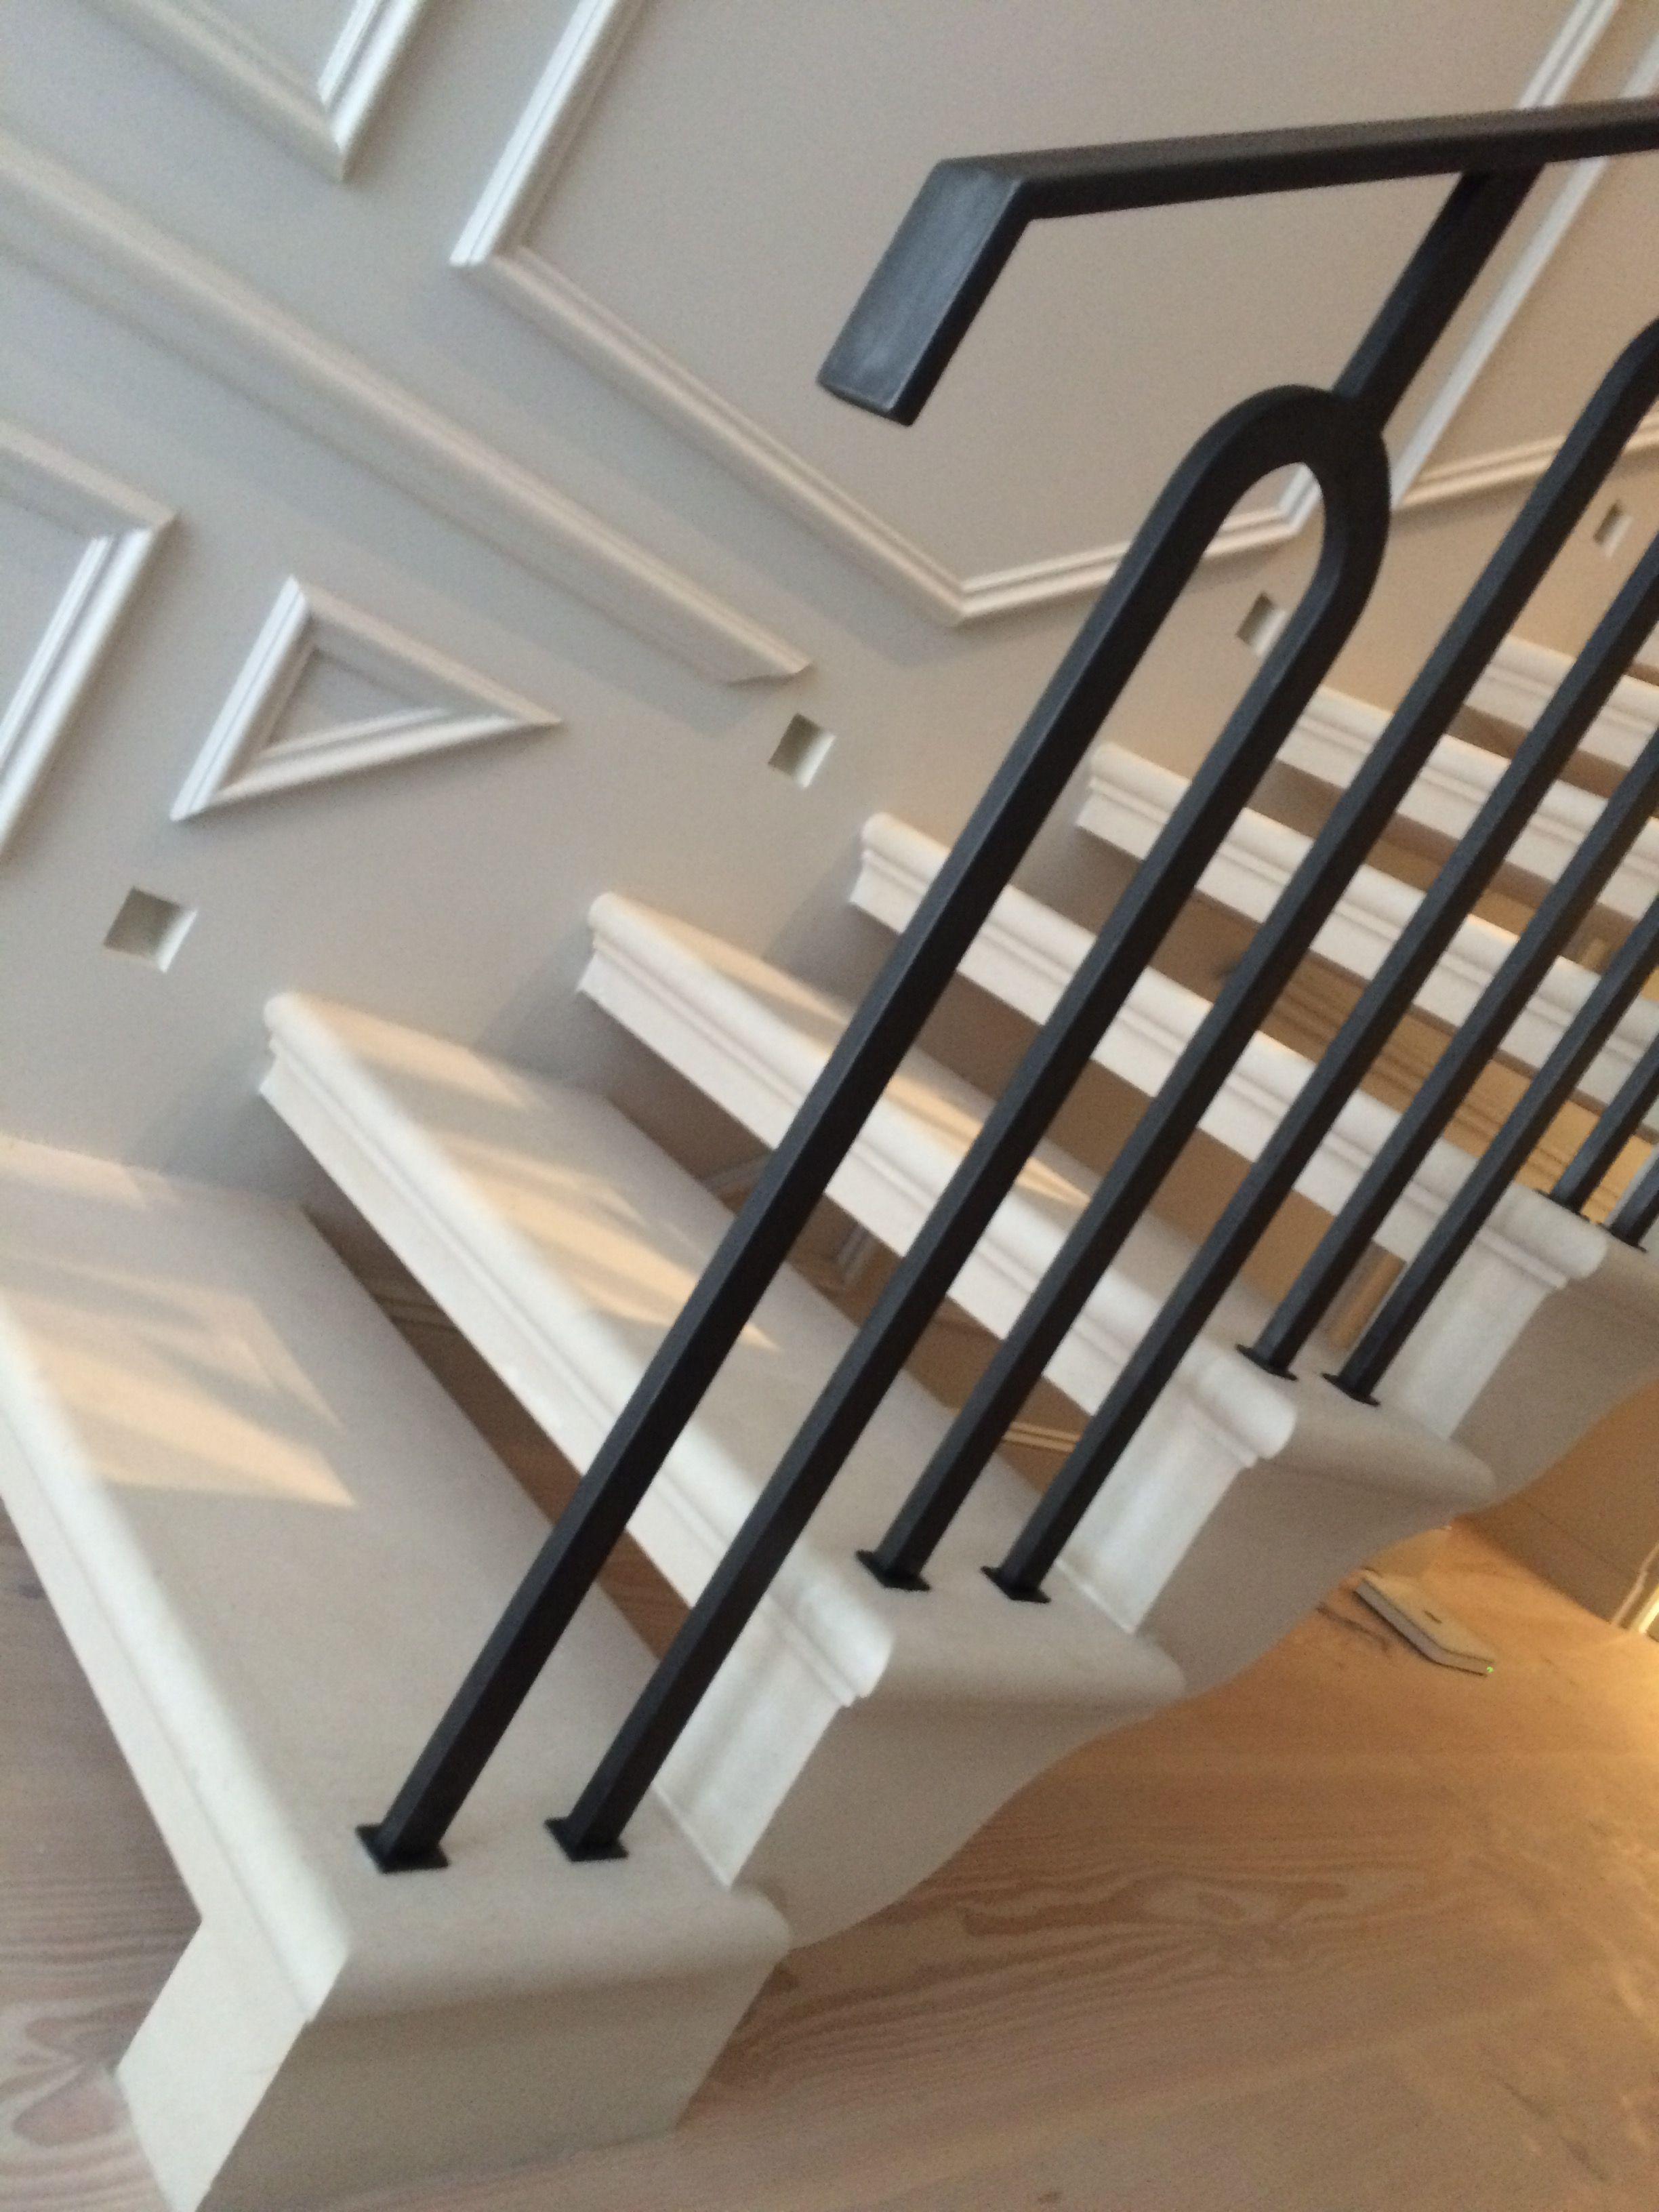 Captivating Open Treads Stone Staircase.Portland Limestone. Cantilever Stair. By  Thestonemasonrycompany.co.uk